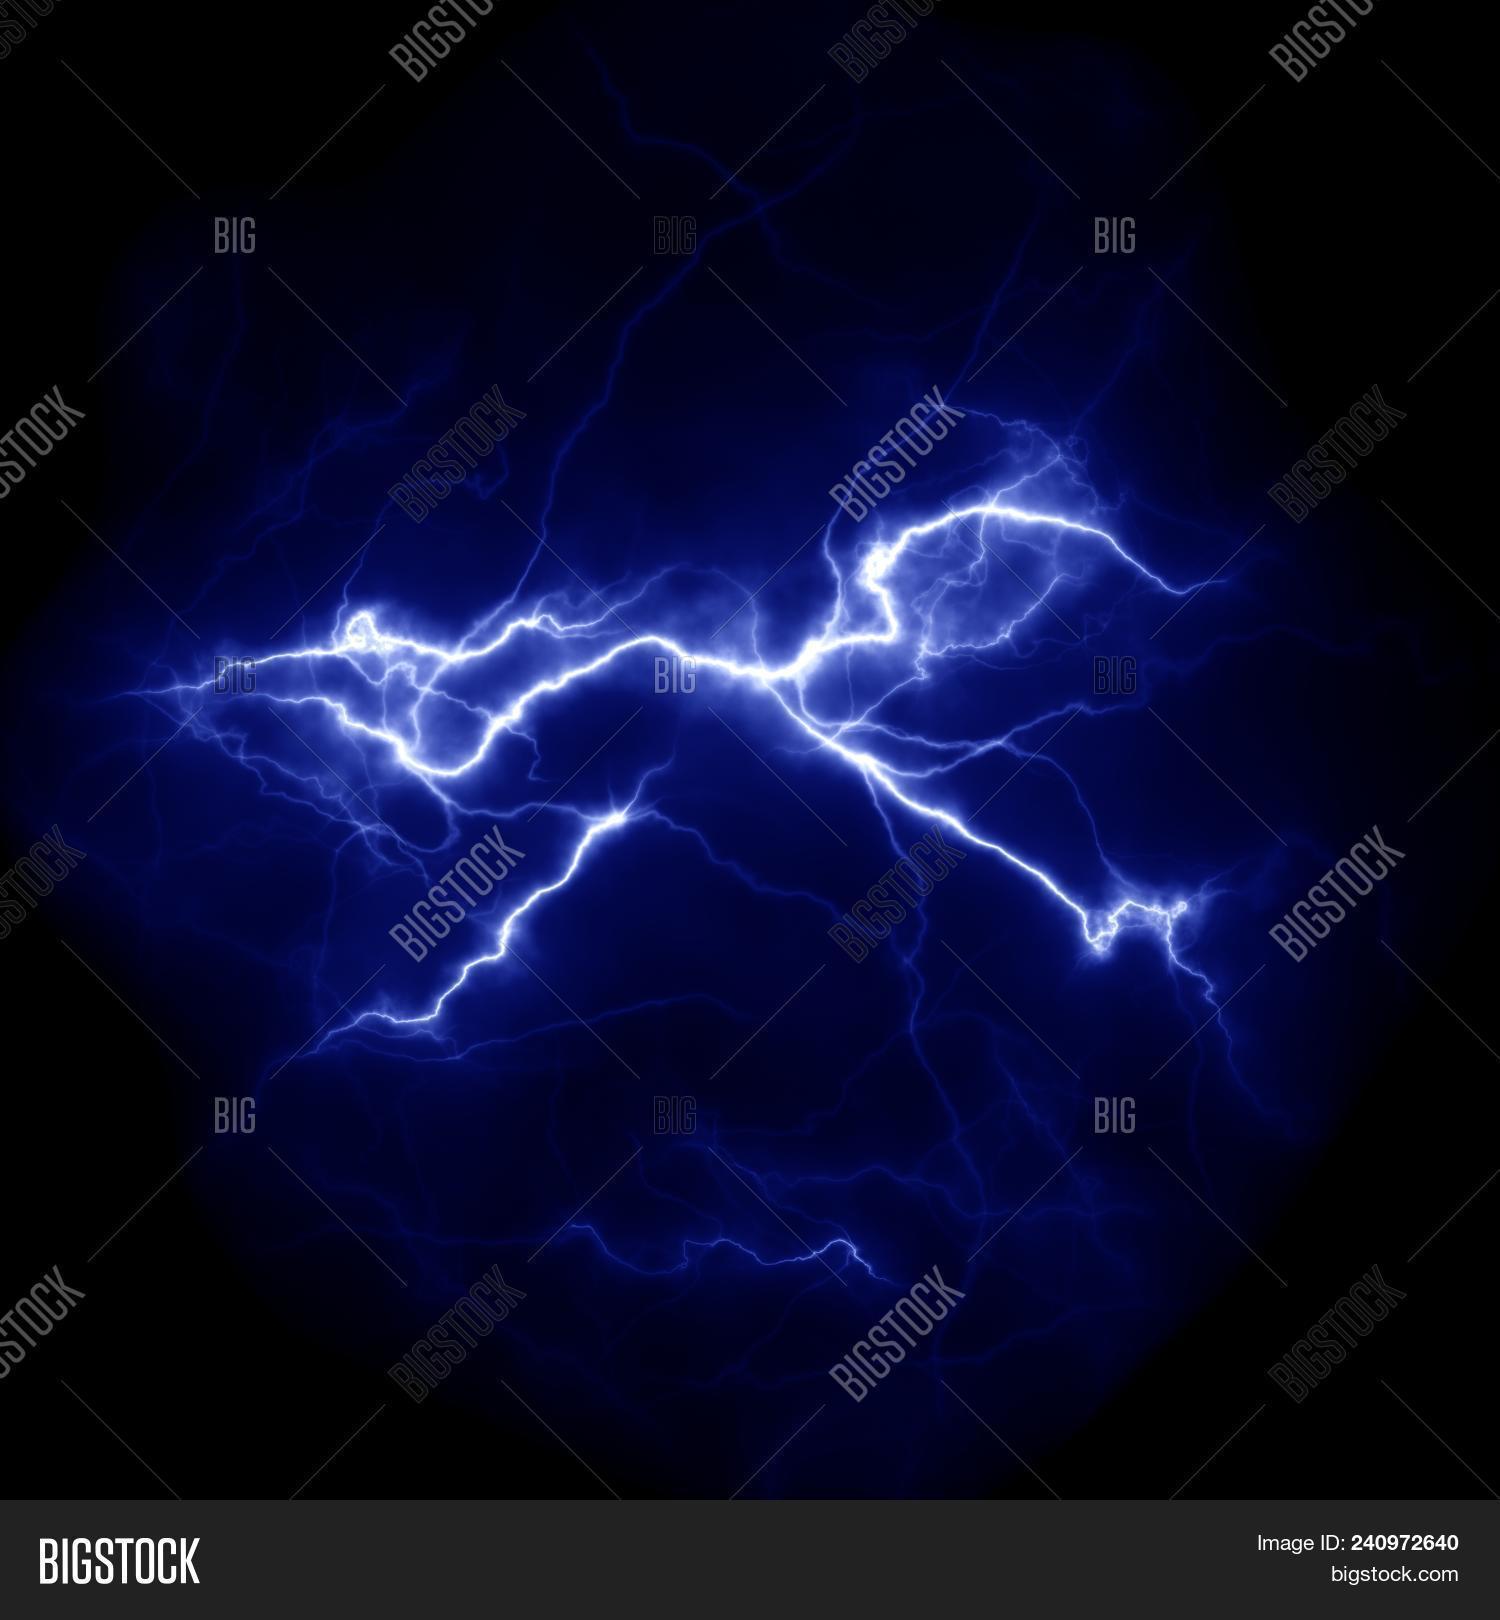 lightning template image photo free trial bigstock